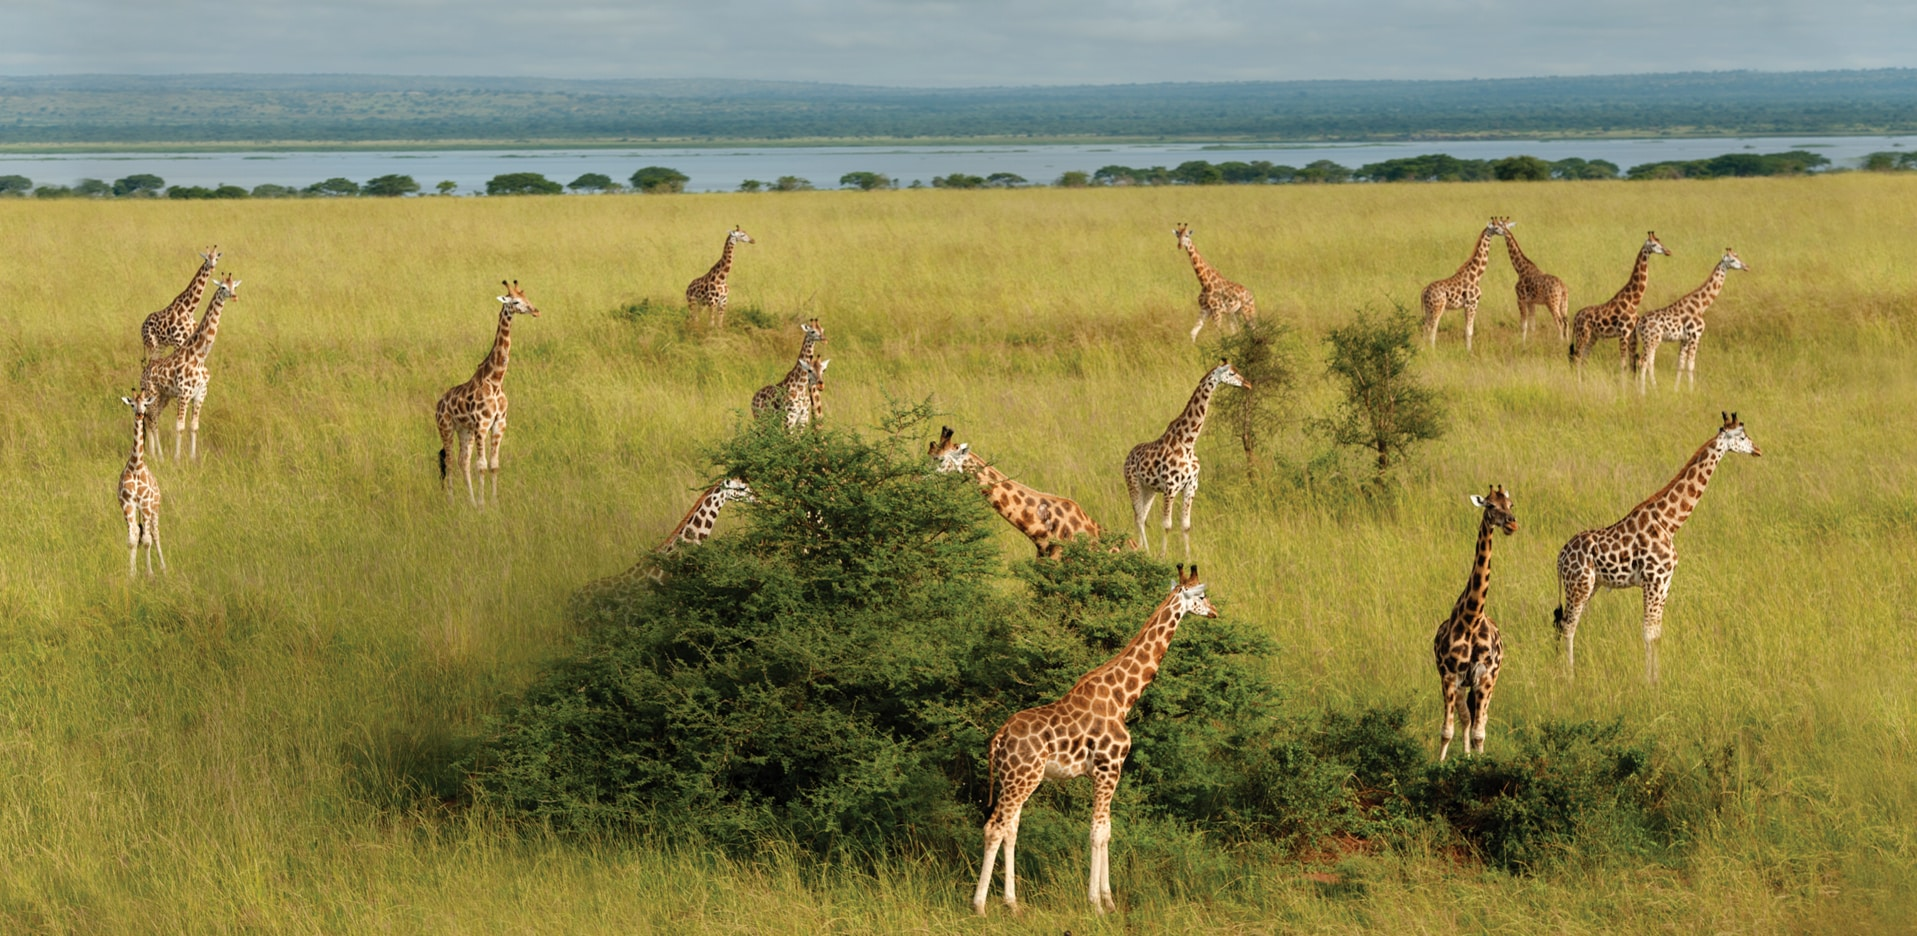 three-ways-safari.jpg